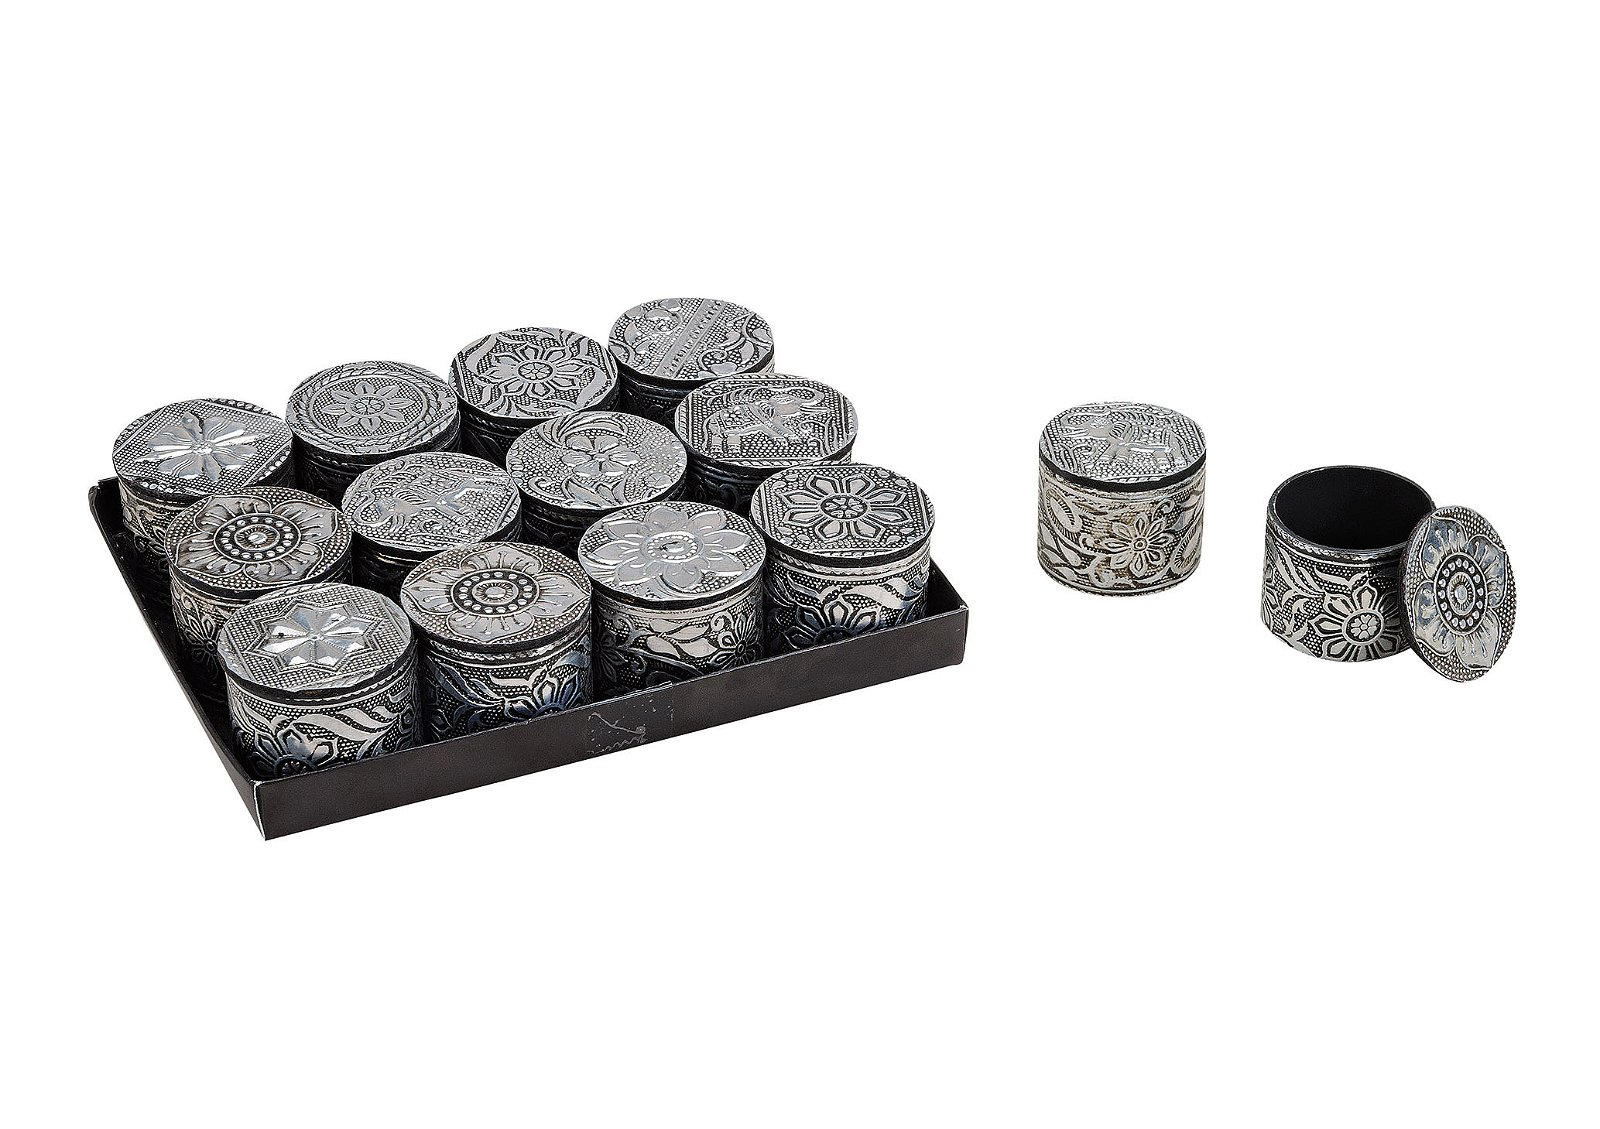 JEWELERY BOX ORIENTAL PLASTIC 12-ASS. 4X5 CM}